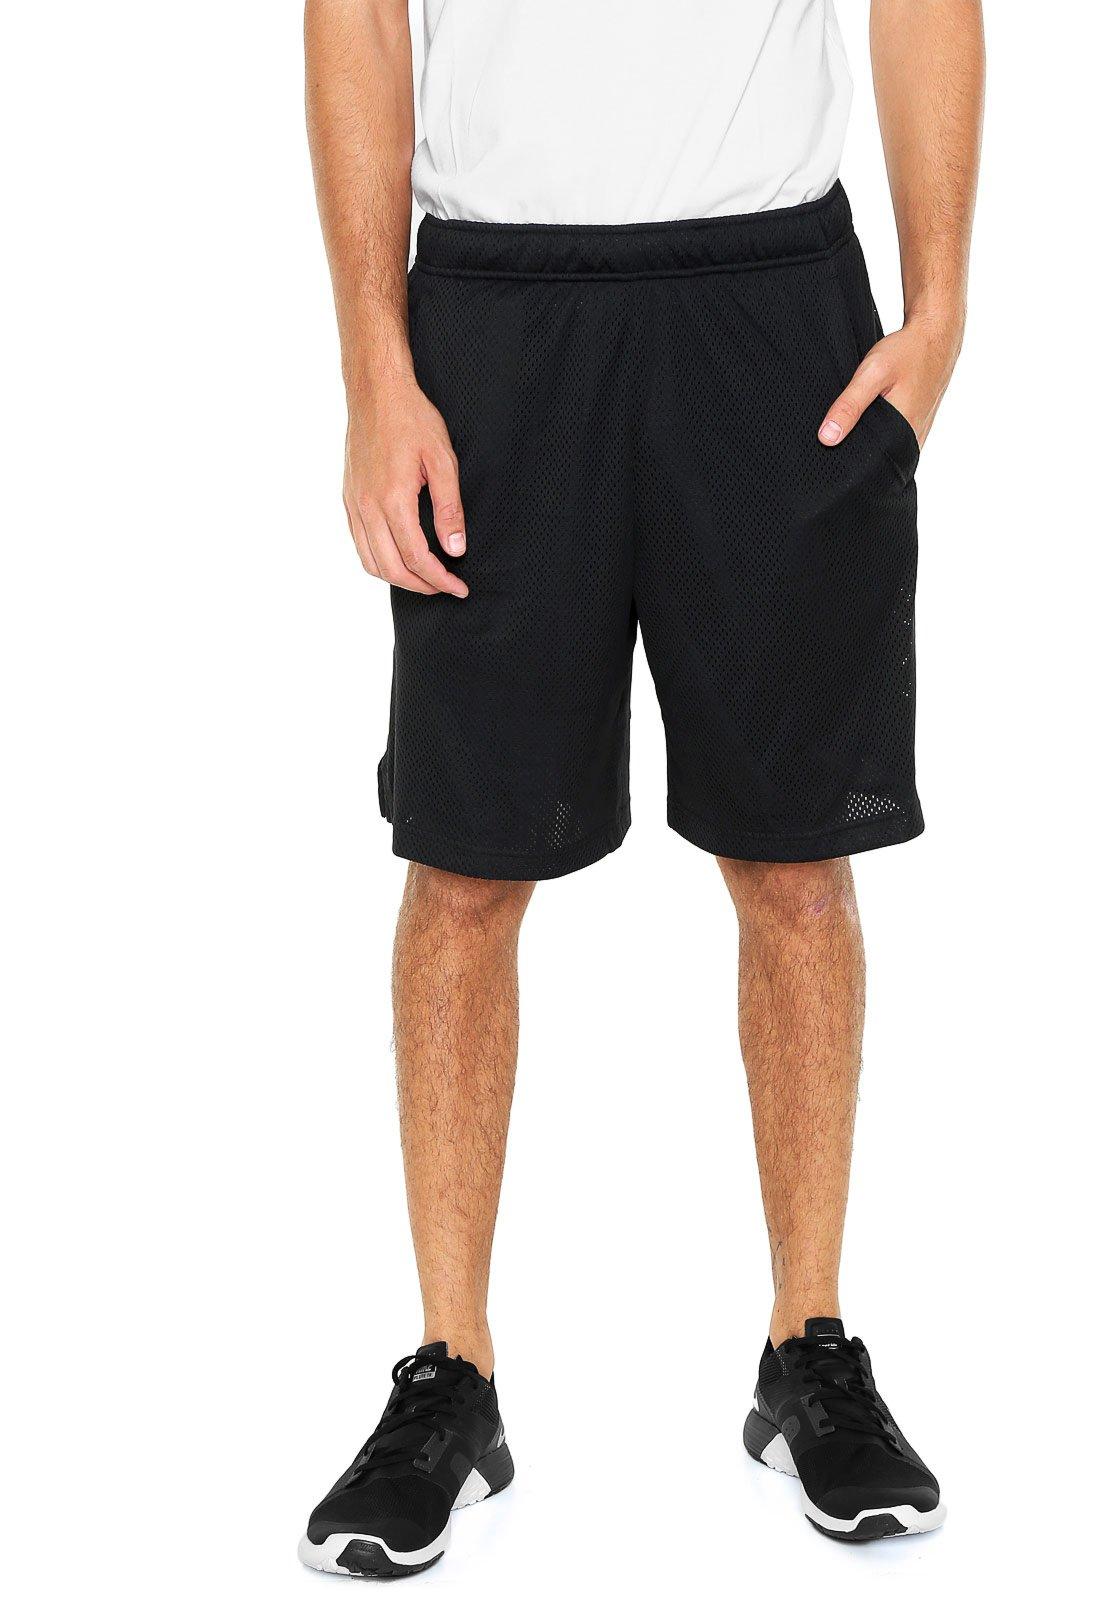 26095252b2 Bermuda Nike 9In Monster Mesh Preta - Compre Agora